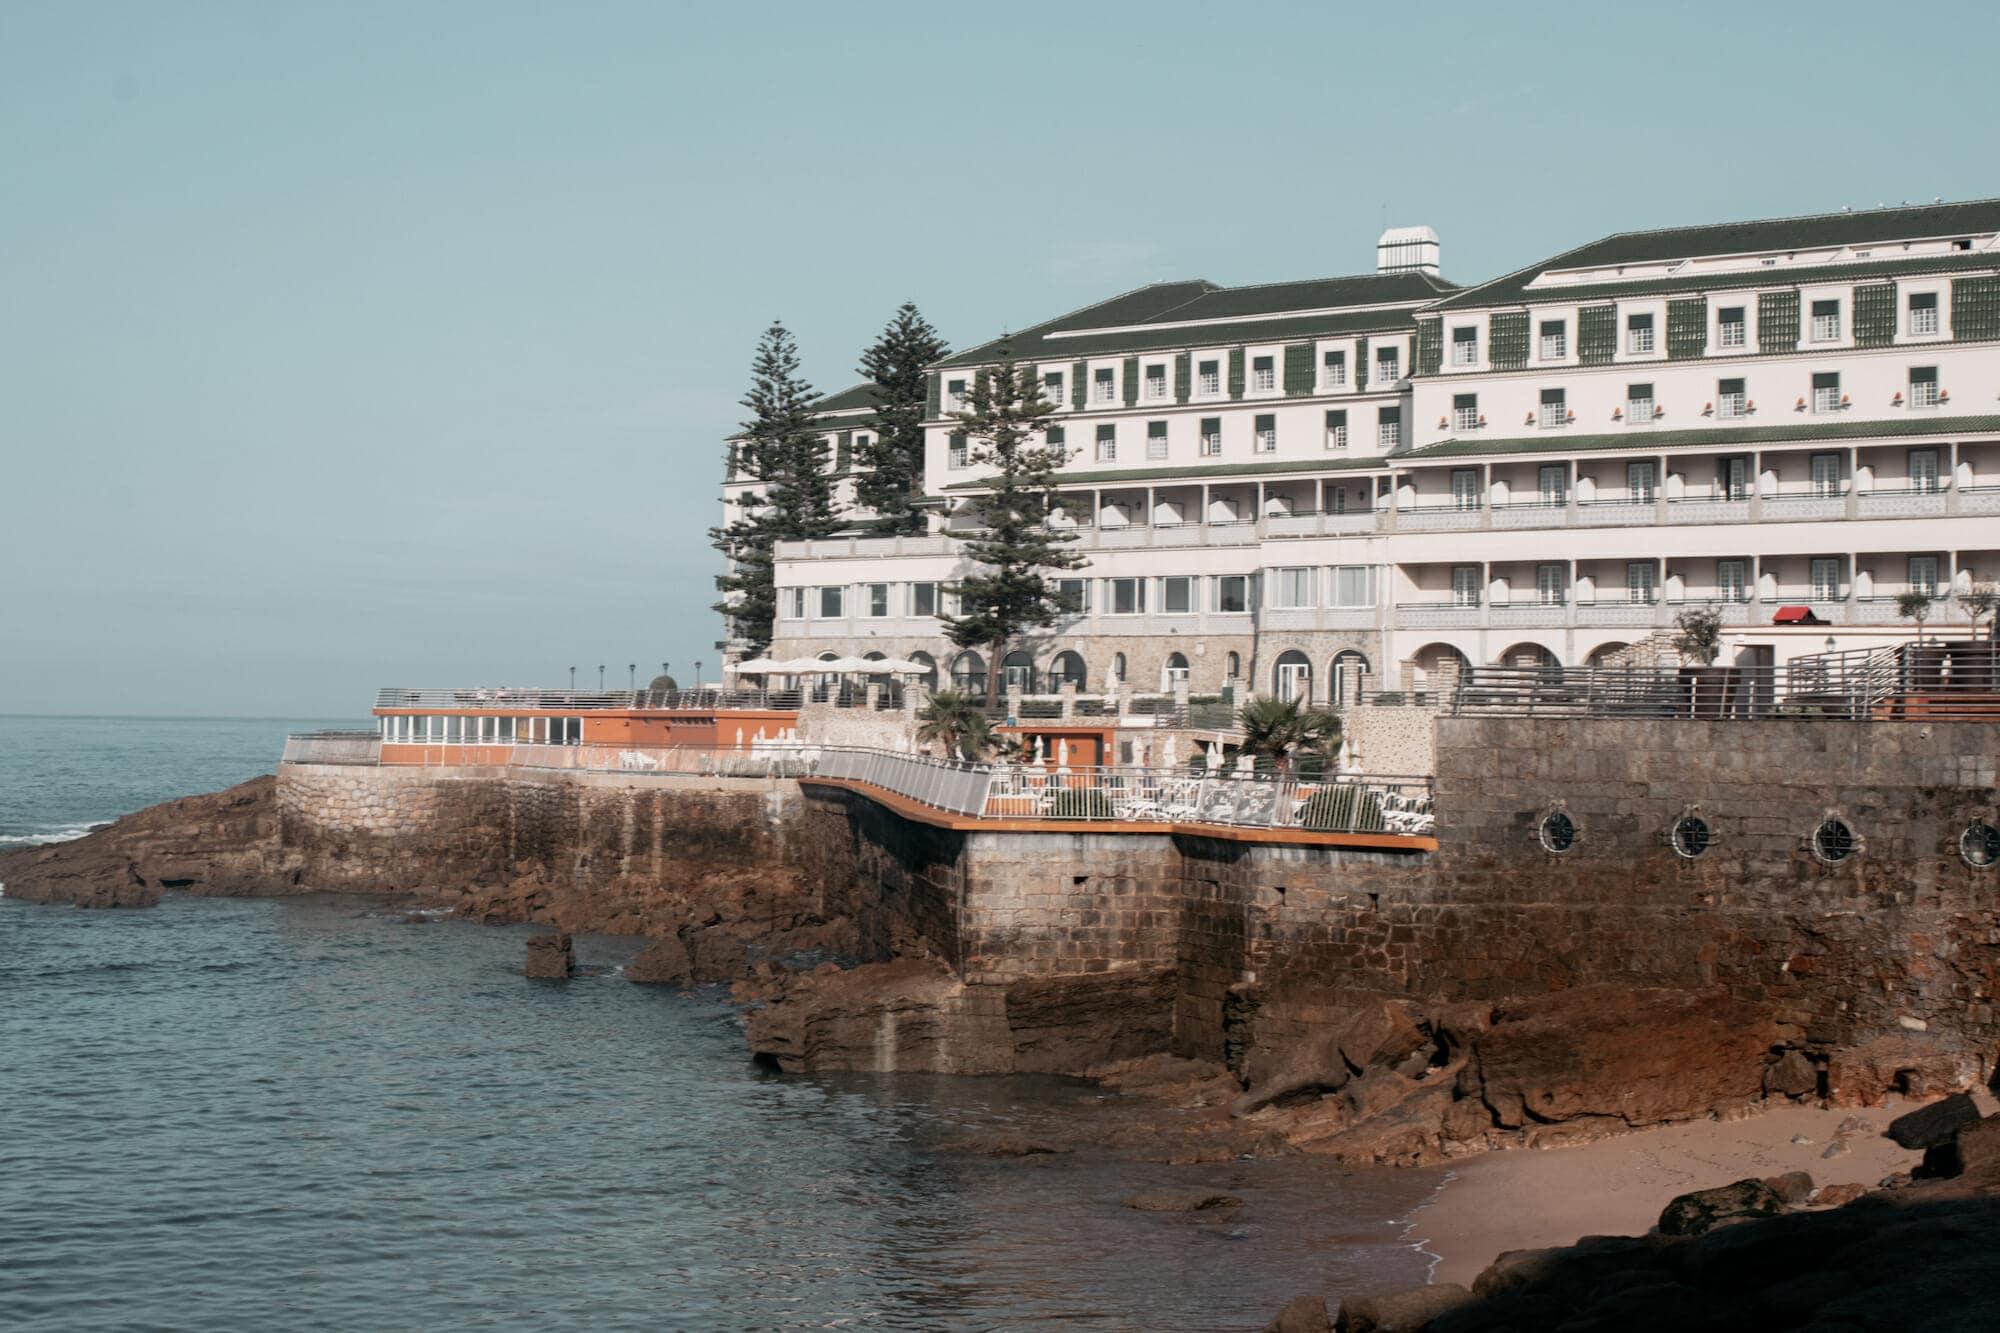 vila gale hotel ericeira portugal